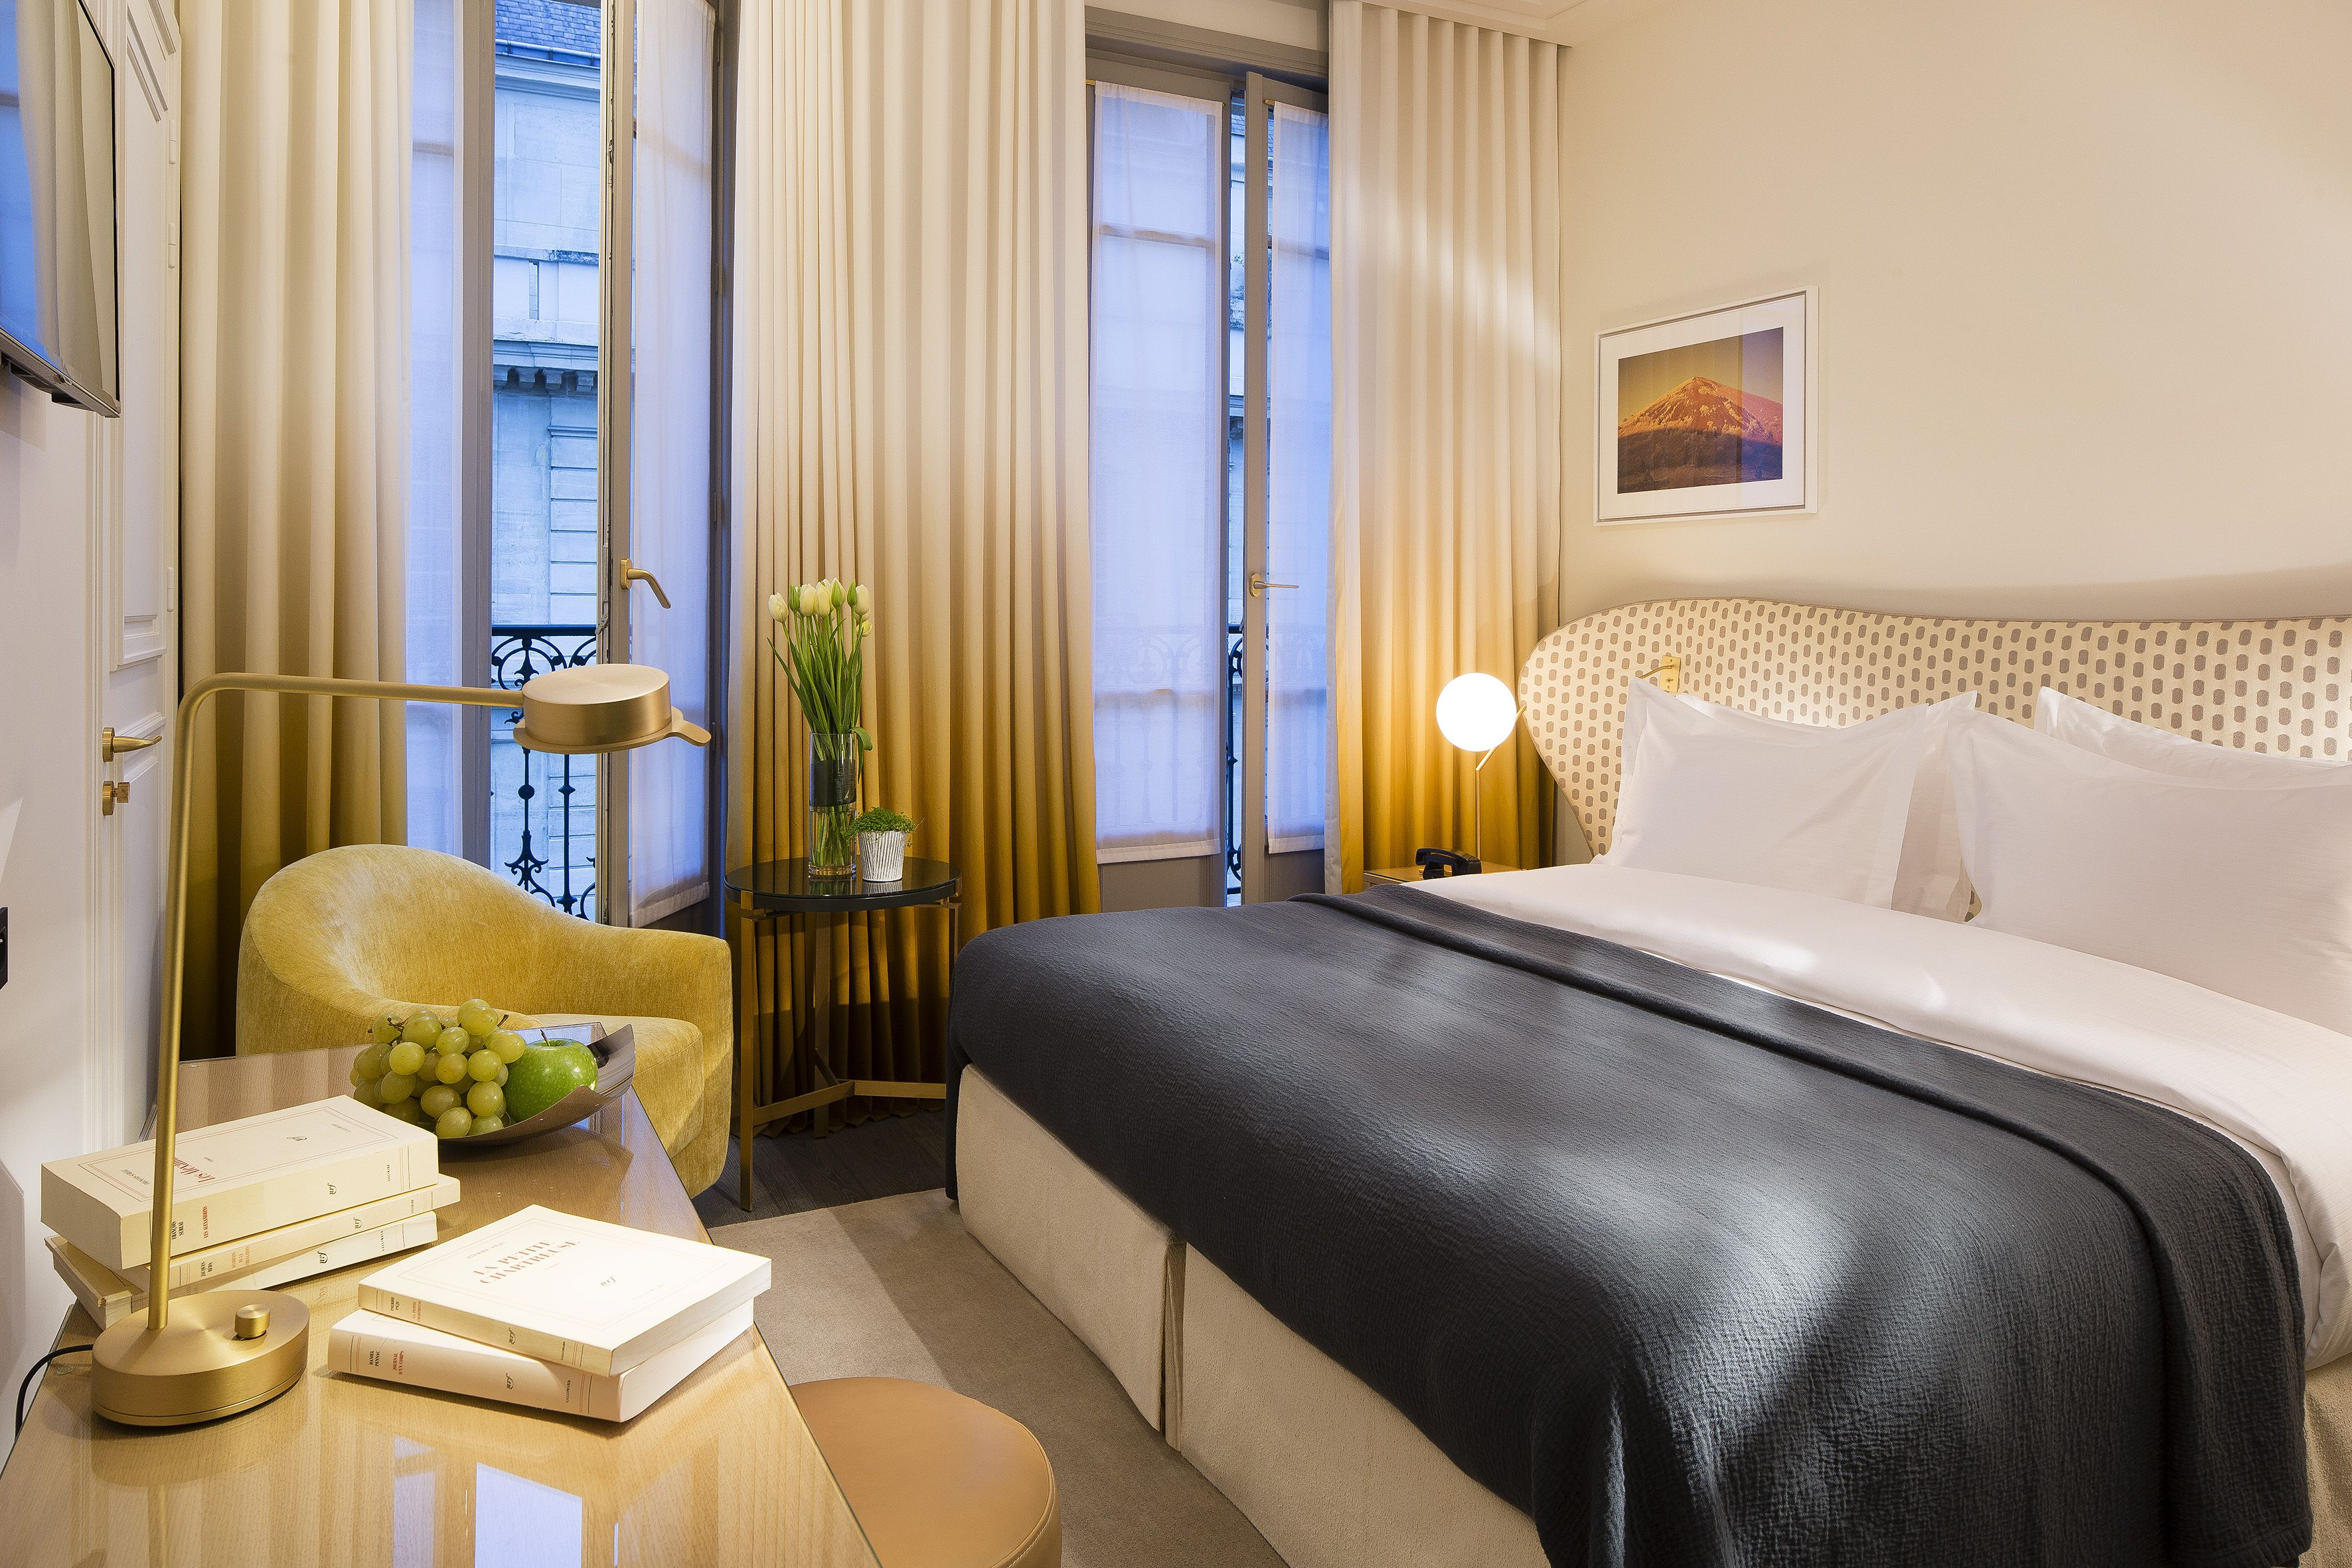 Hotel Le Marianne Paris Chambre Rooms Hotel Paris Champselysees Luxurious Bedrooms Interior Design Interior Design Trends,Glass Church Pulpit Designs